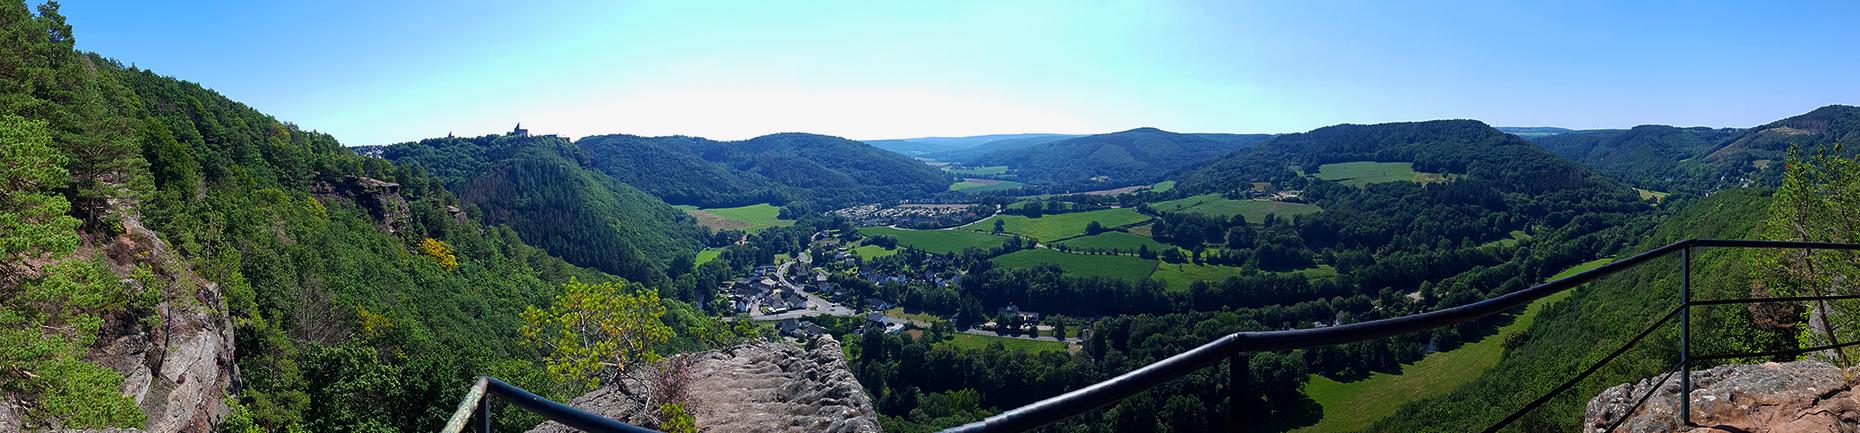 Buntsandsteinroute Eifel Nideggen Burg Aussicht Nationalpark Eifel